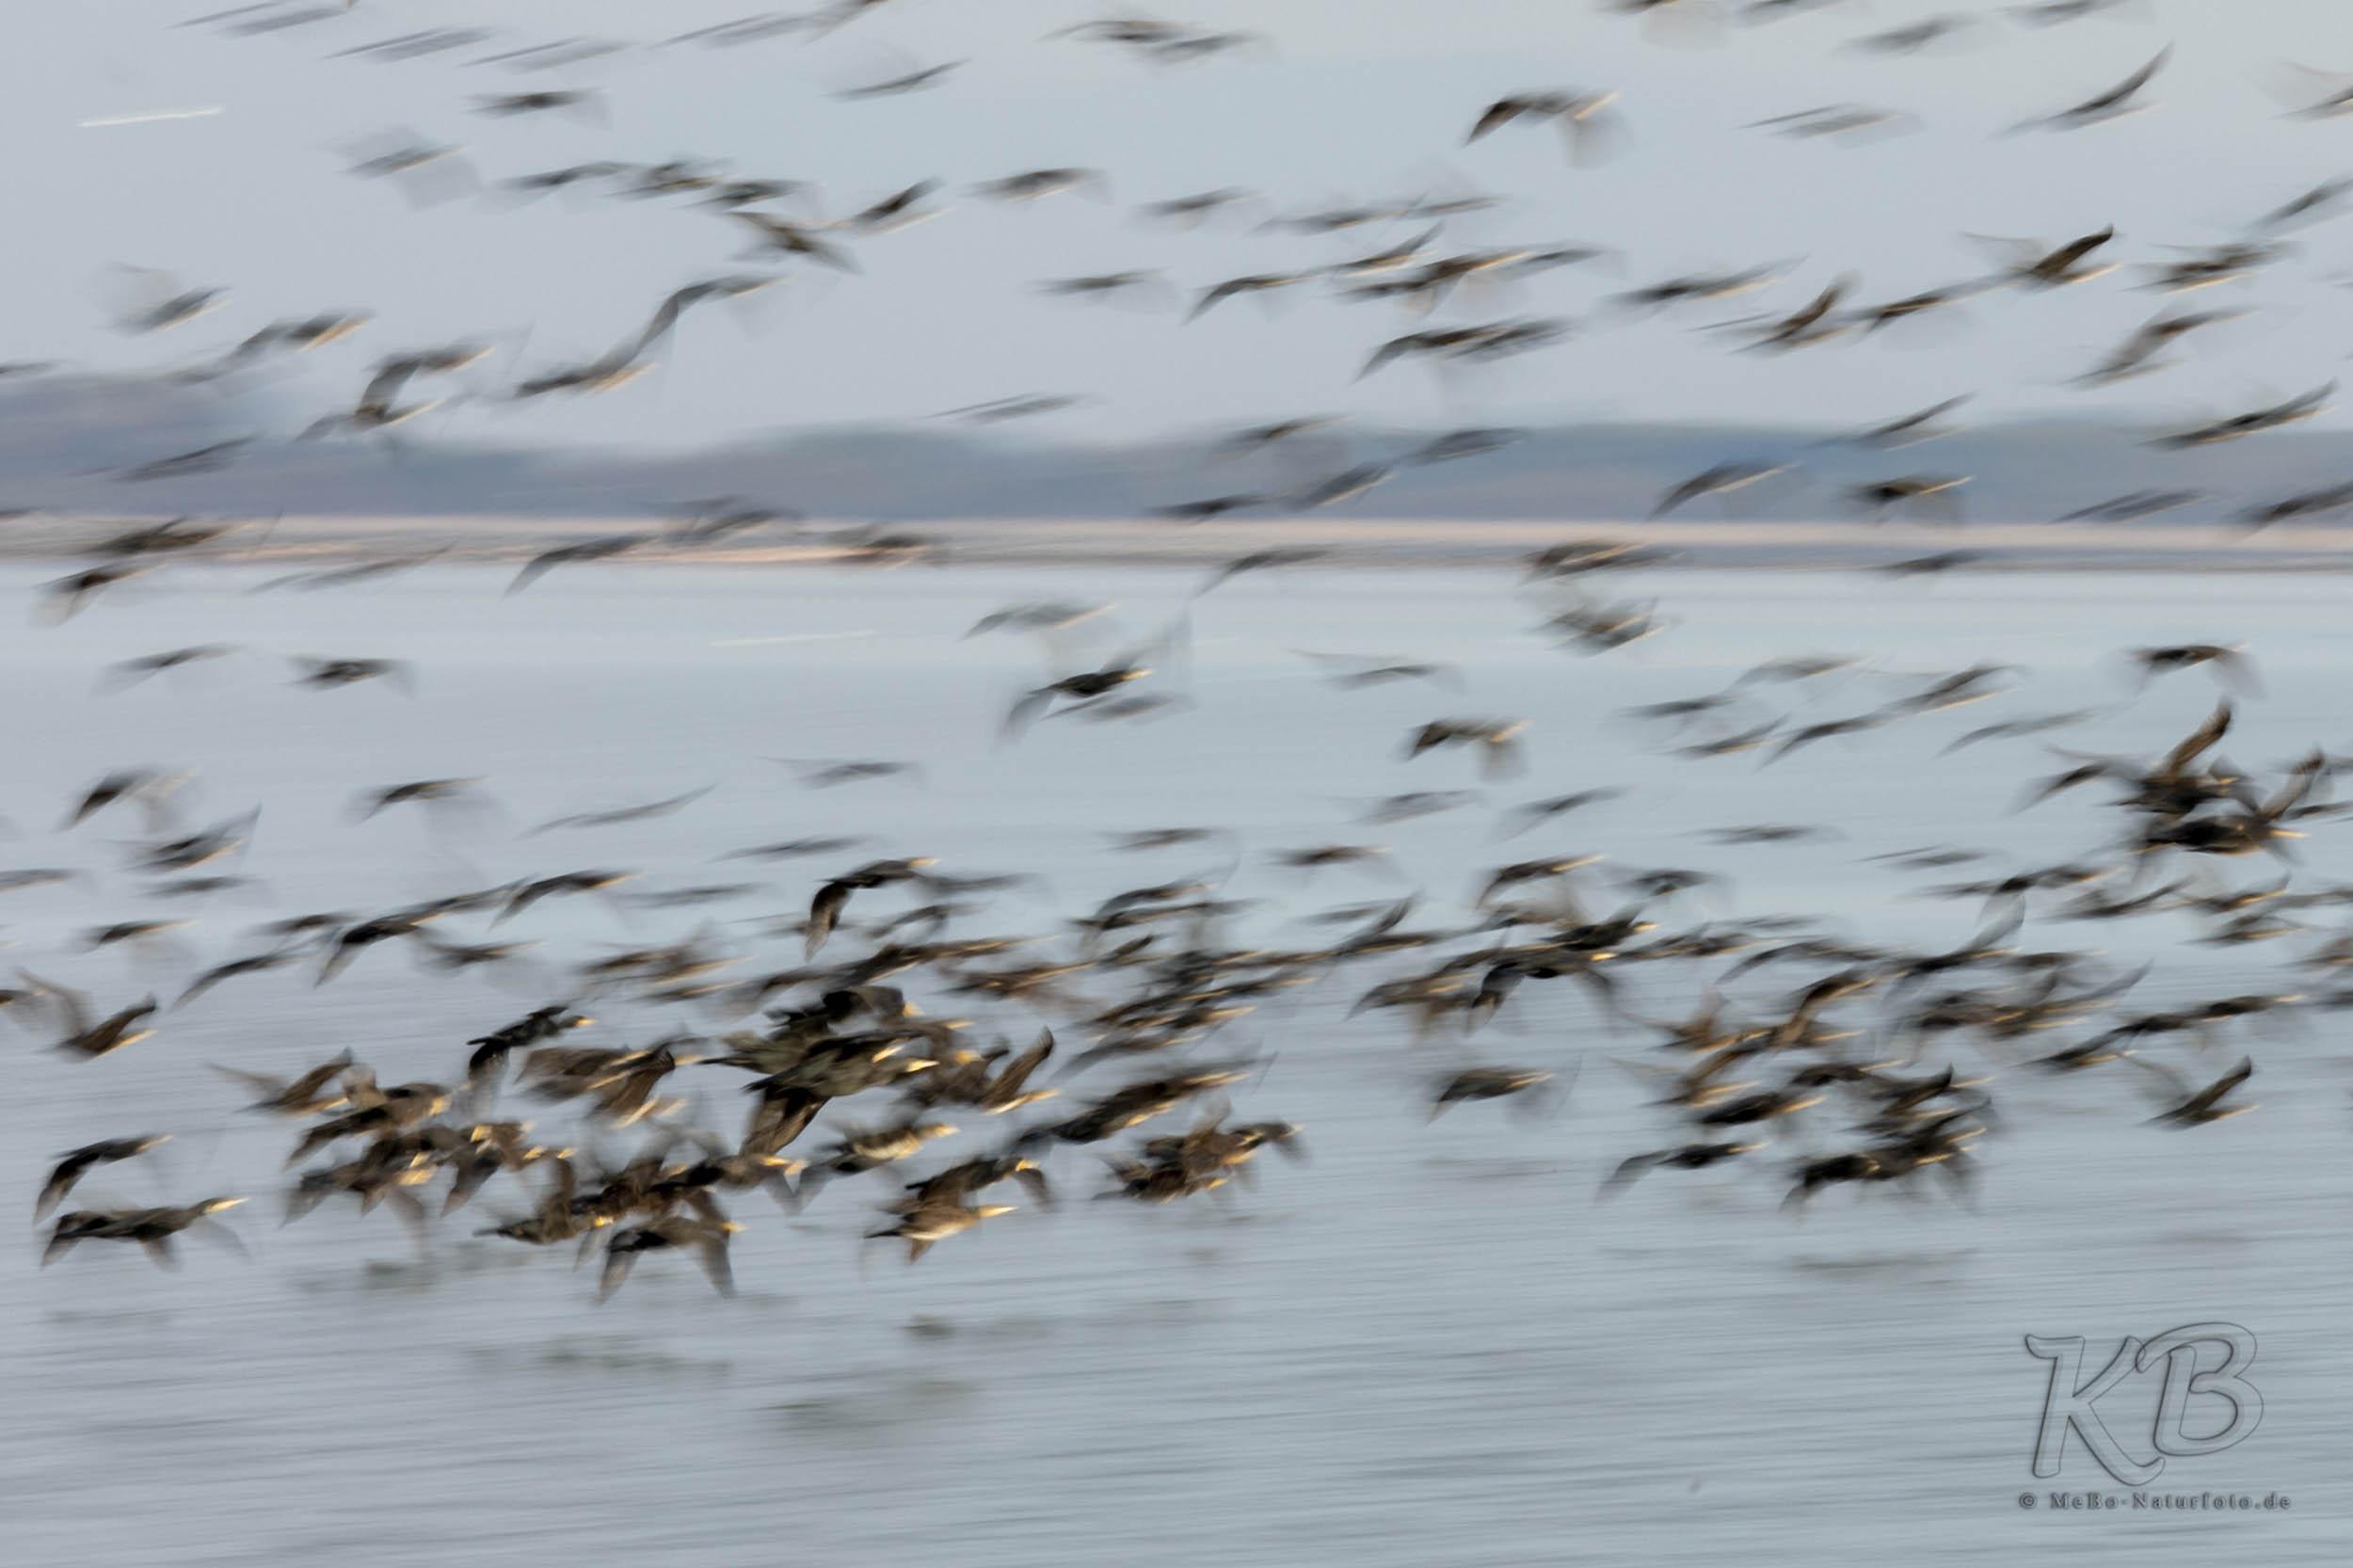 Zehntausend Kormorane leben am Kerkini-See